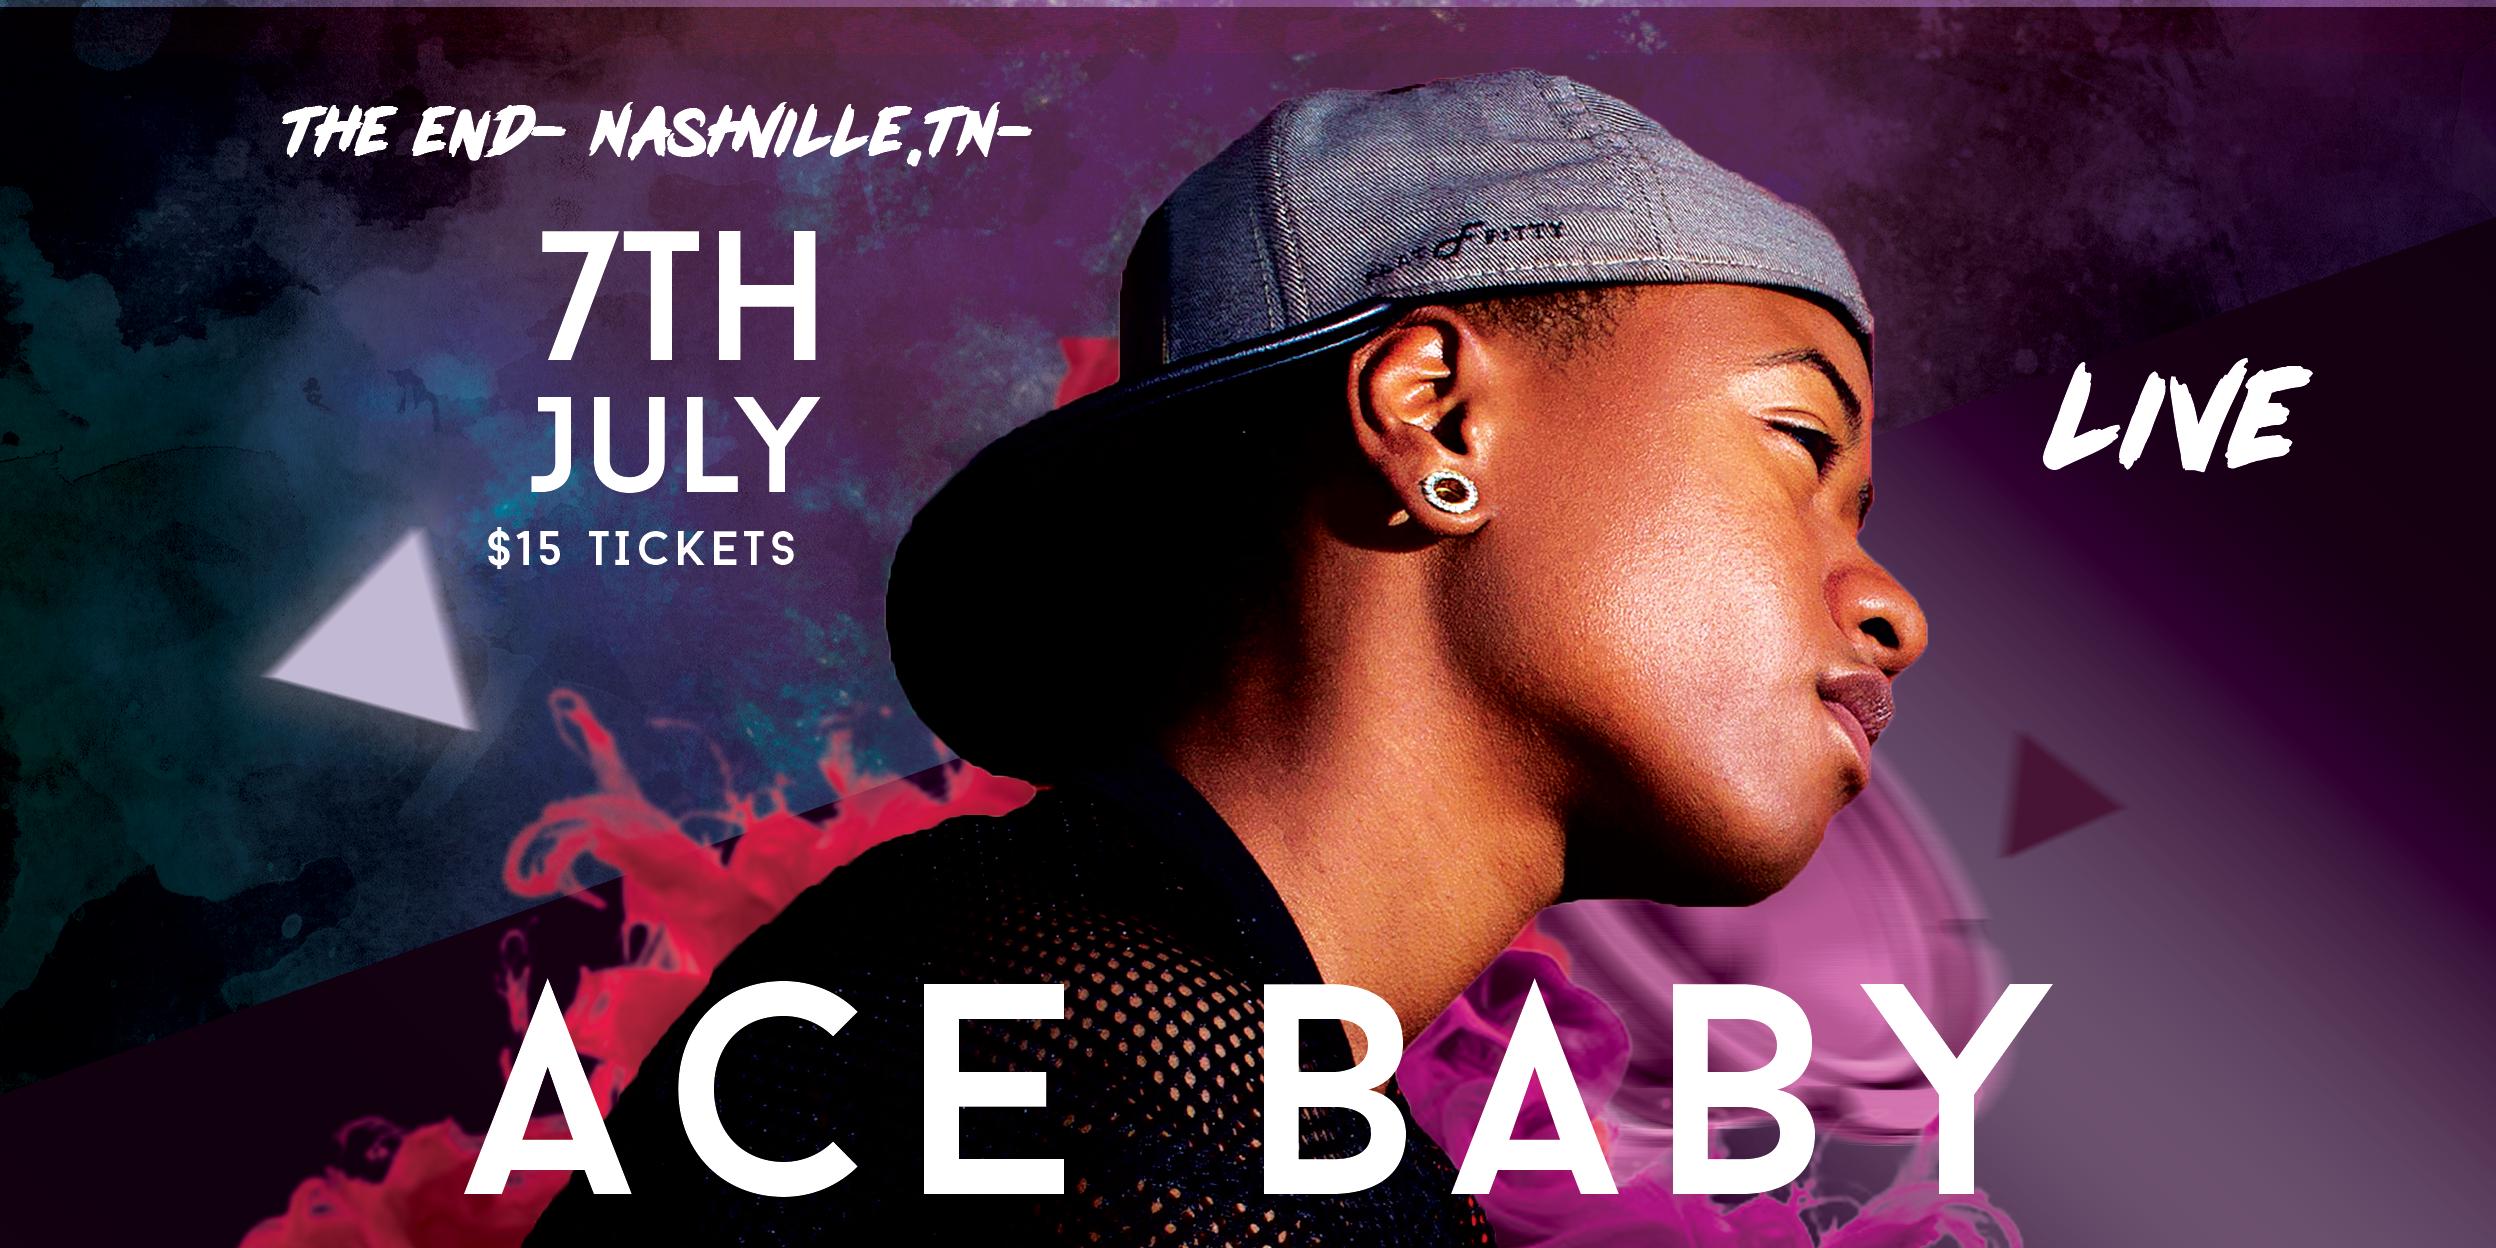 Ace Baby Live @ The End - Nashville,Tn